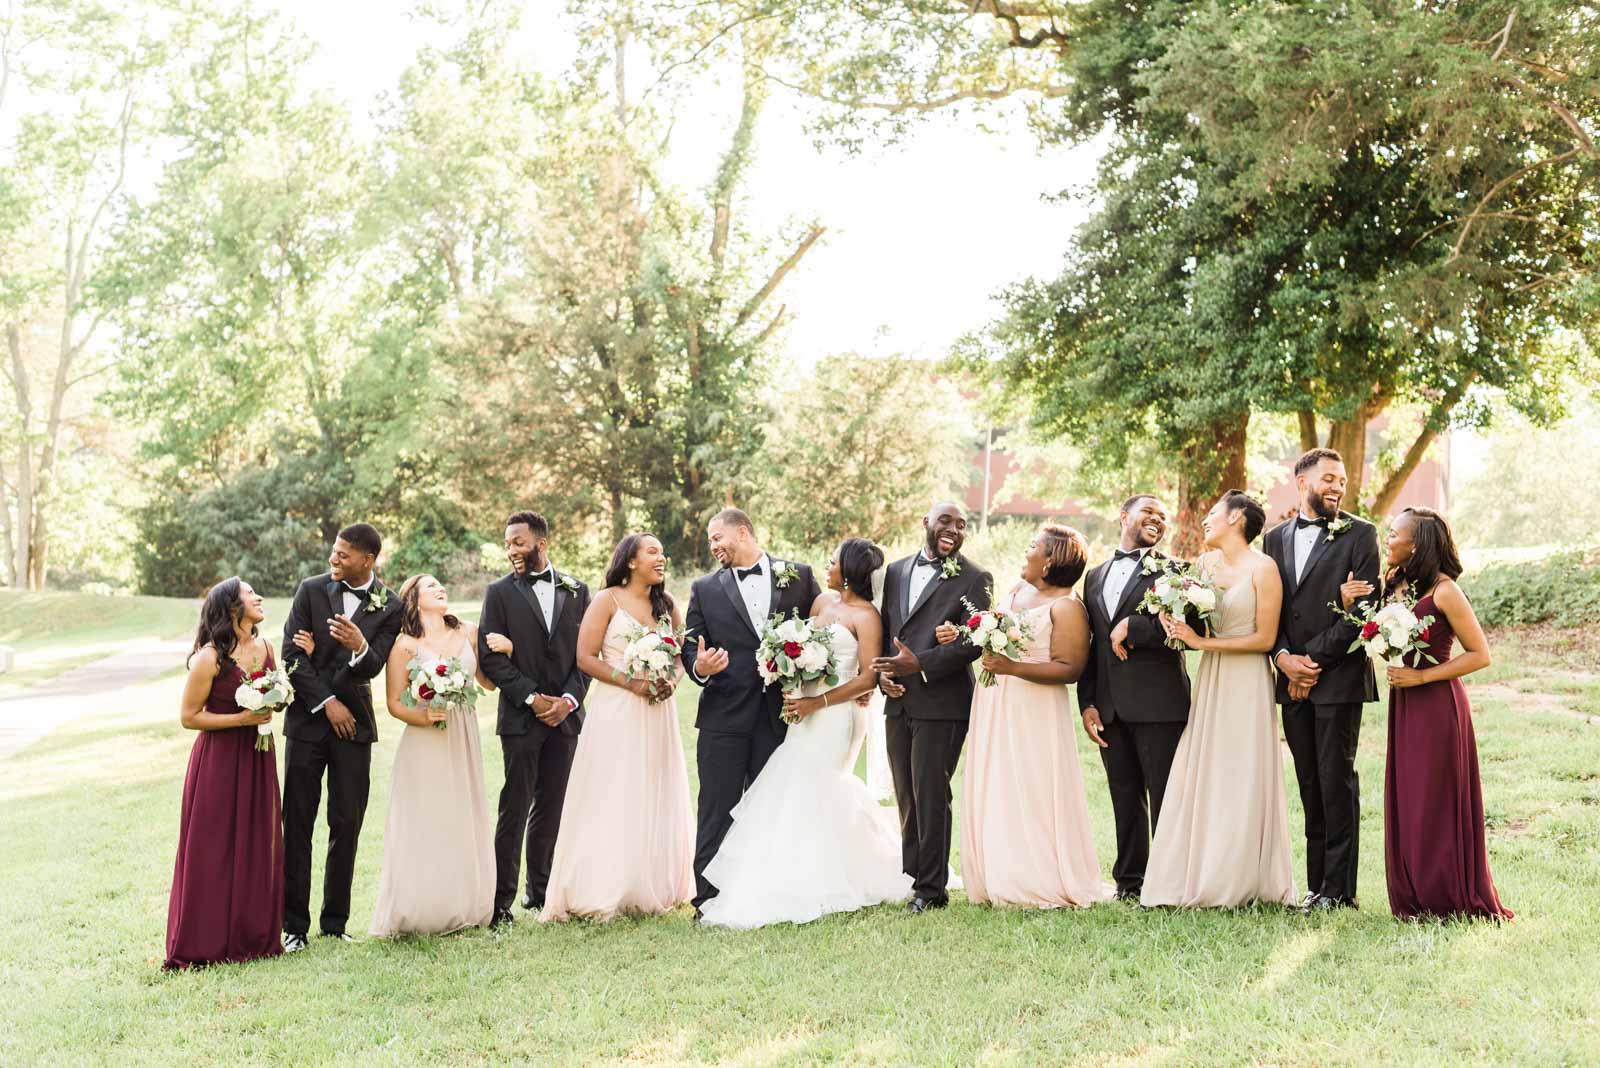 Noah's Event Venue Wedding Markie Walden Photography-61.jpg